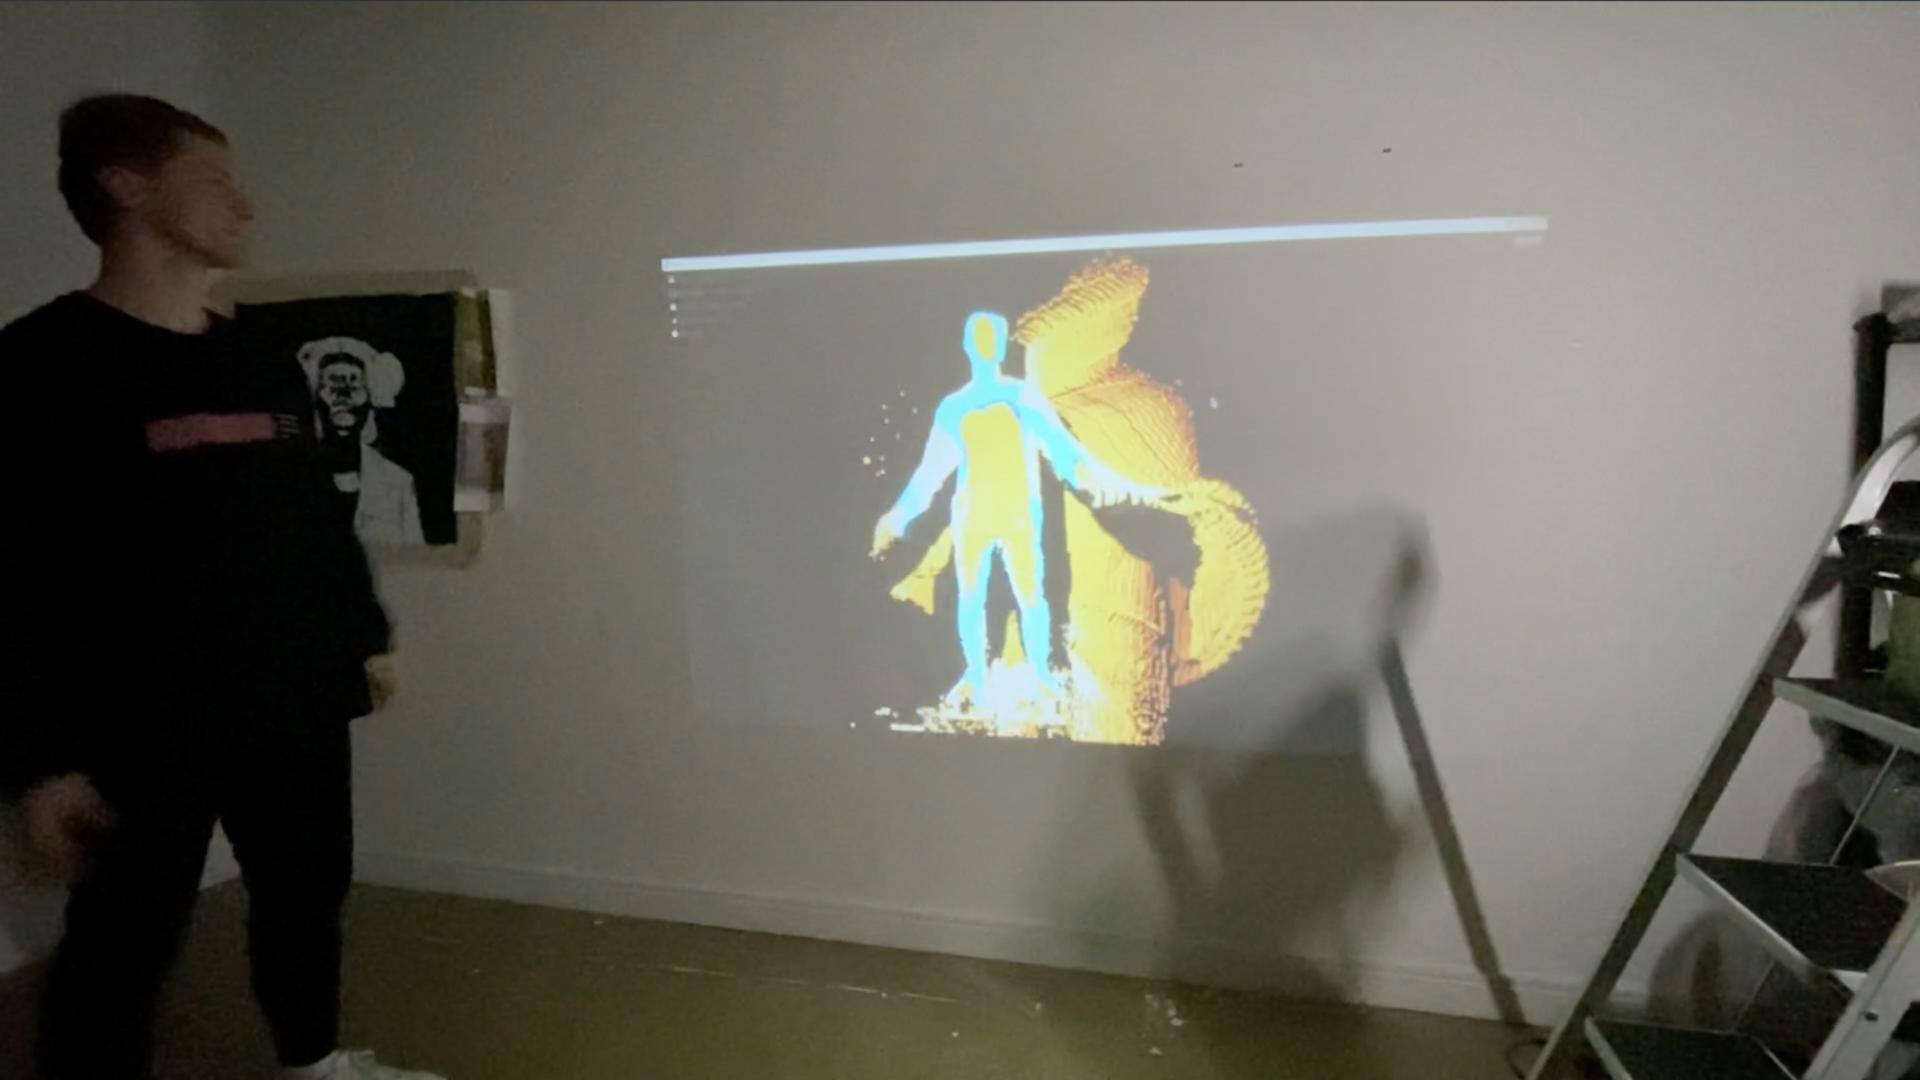 Xbox Kinect Camera - Sound Visualisation Experiment